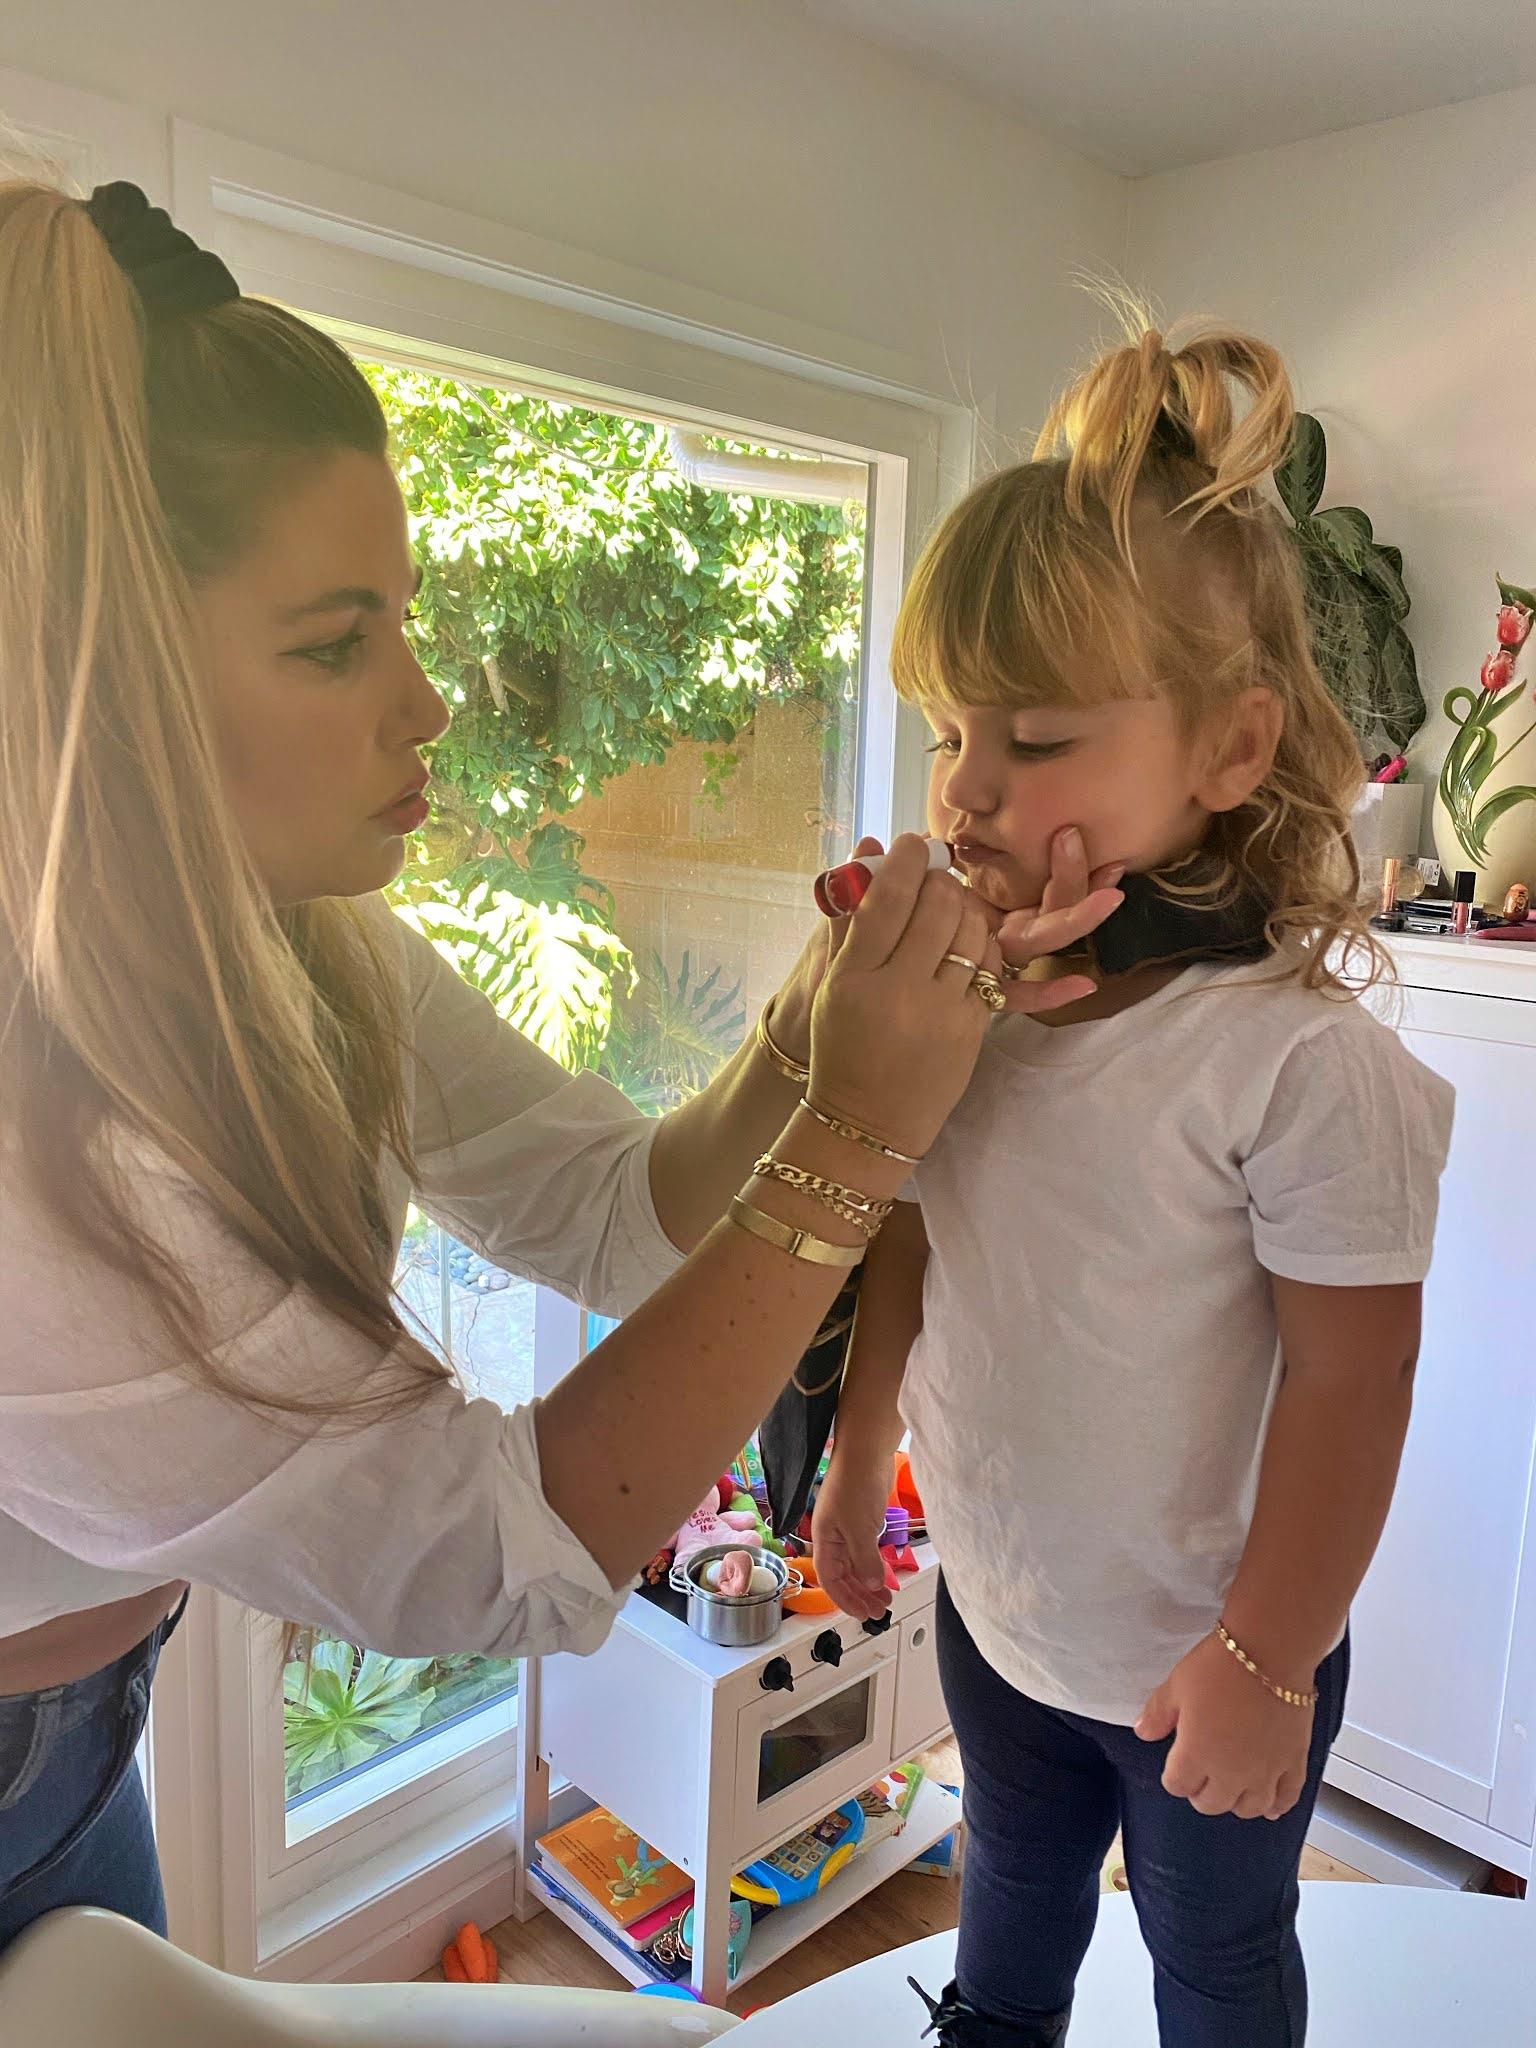 mom putting on lipstick on her kid